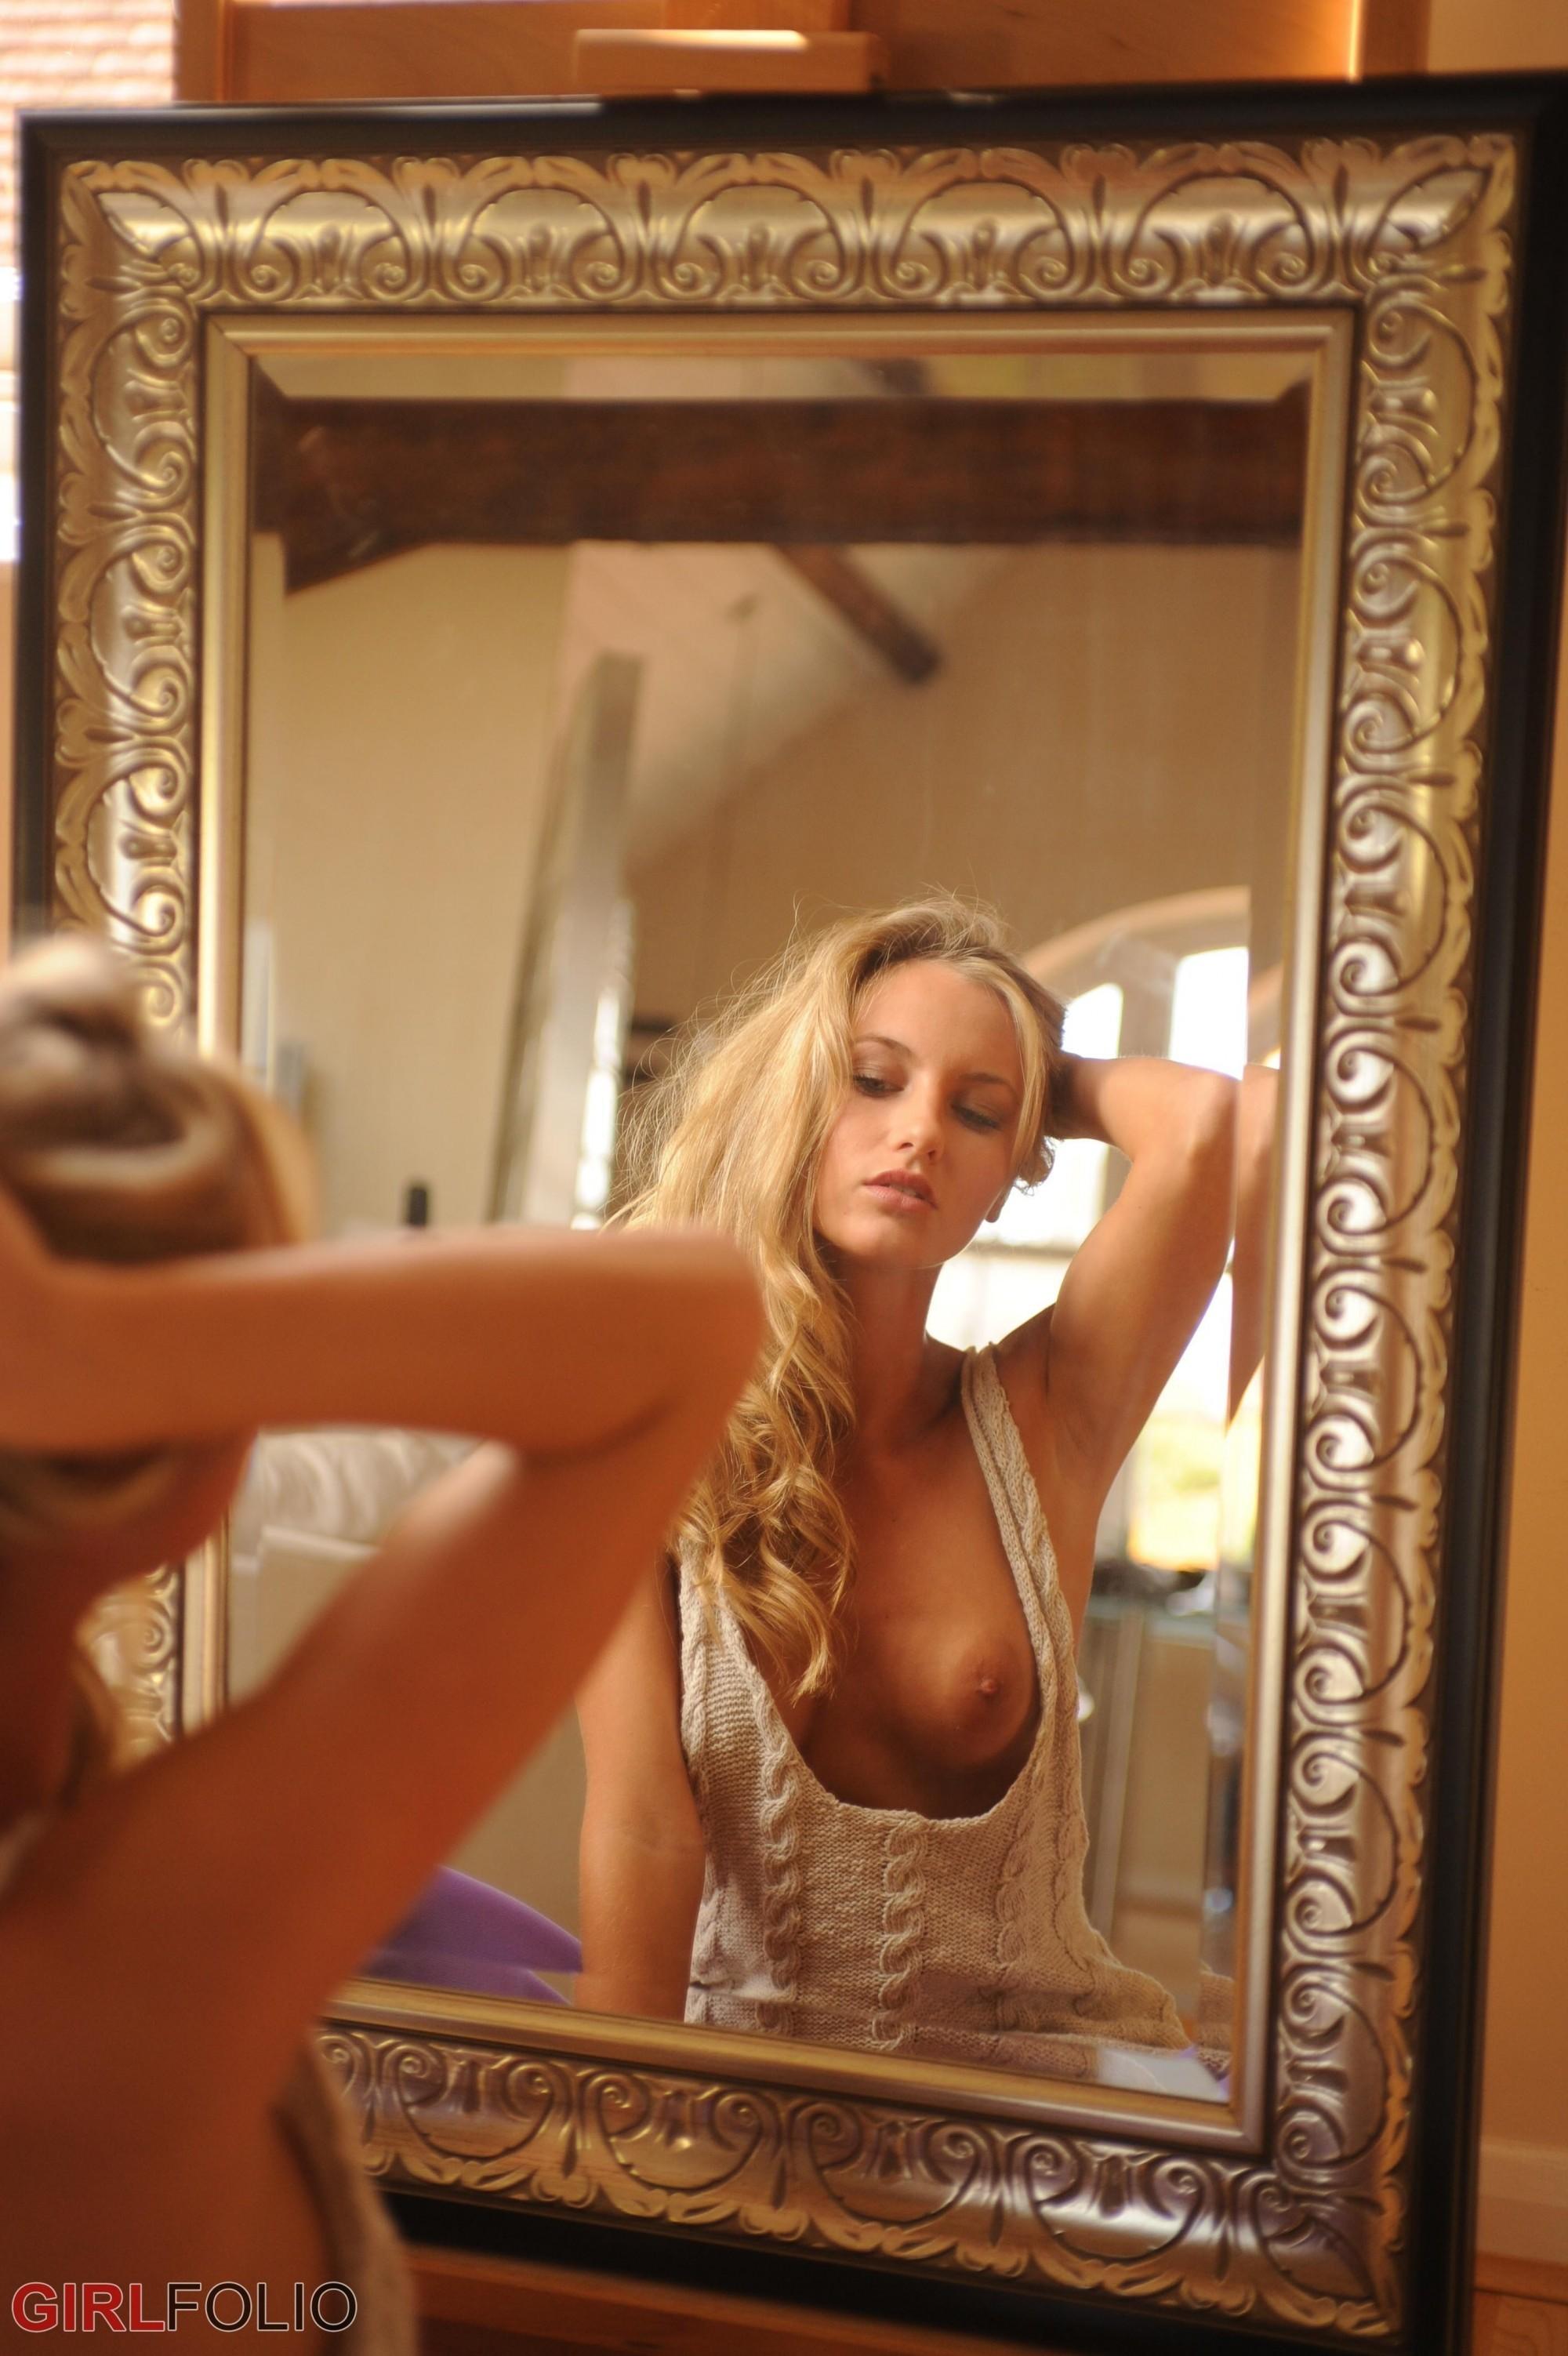 galleries girlfolio assets affiliates gallery natasha b mirror mirror large DSC 1778